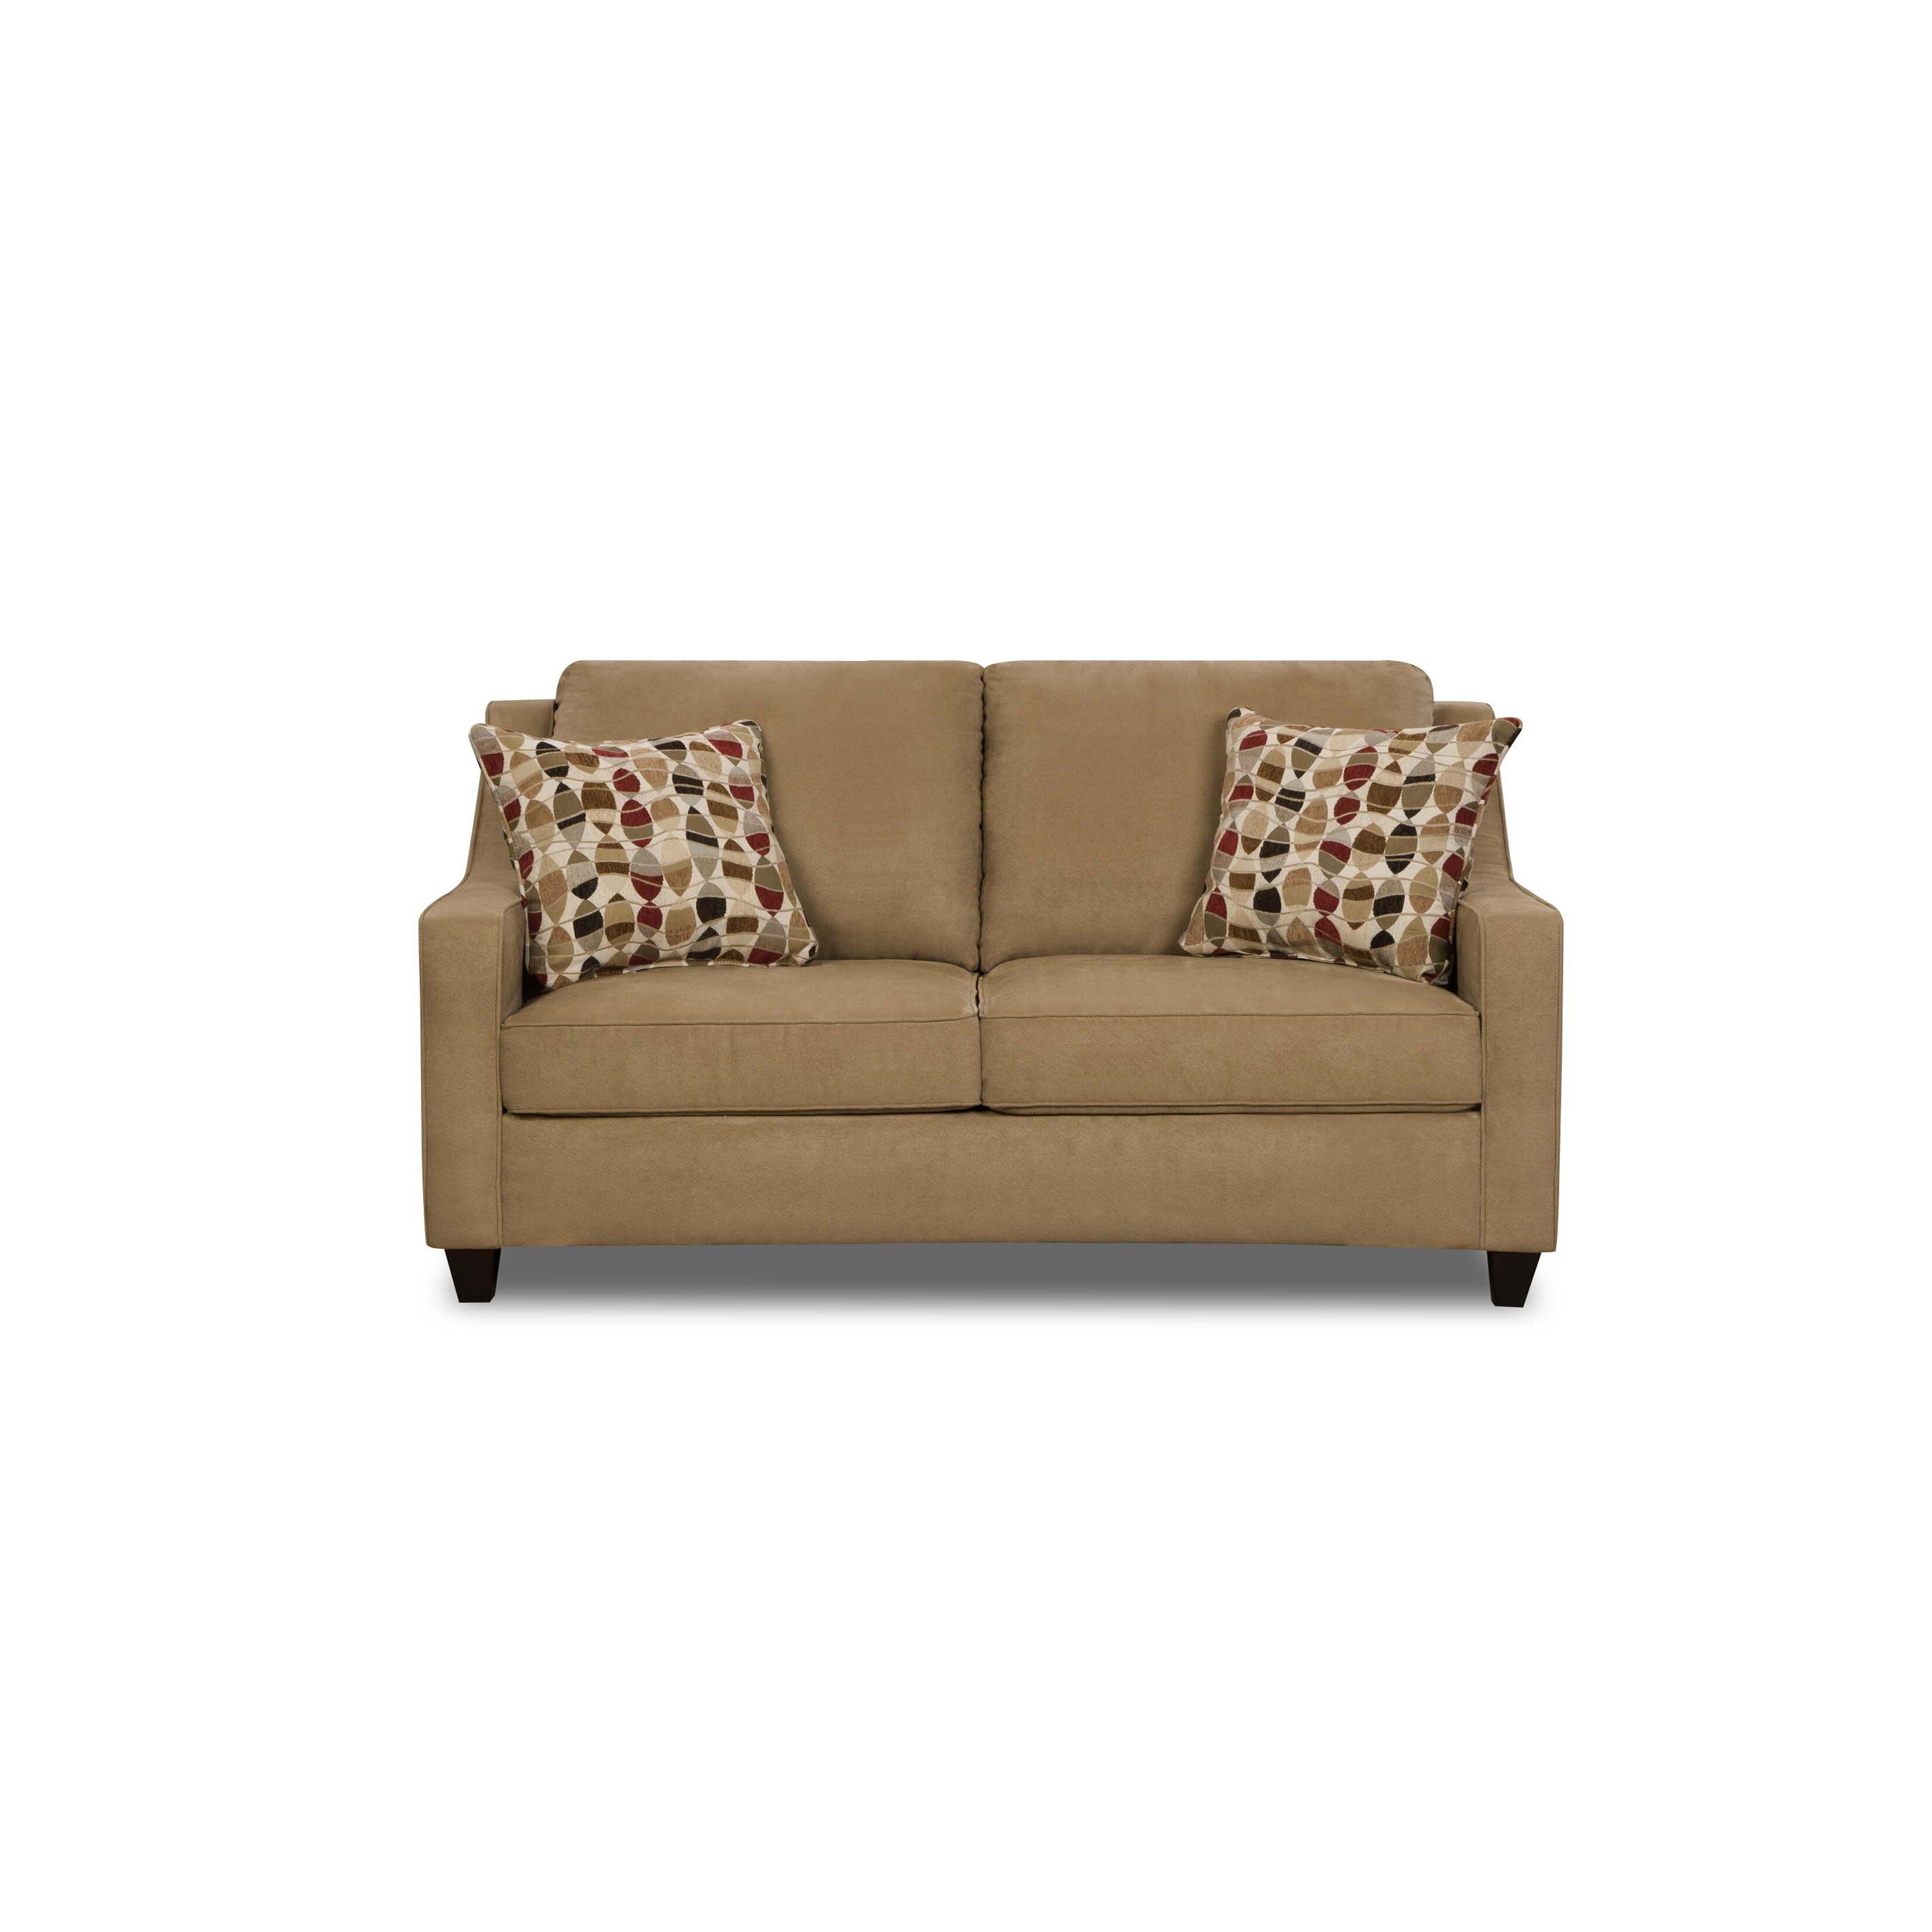 Simmons Sofa Sleeper Review Refil Sofa